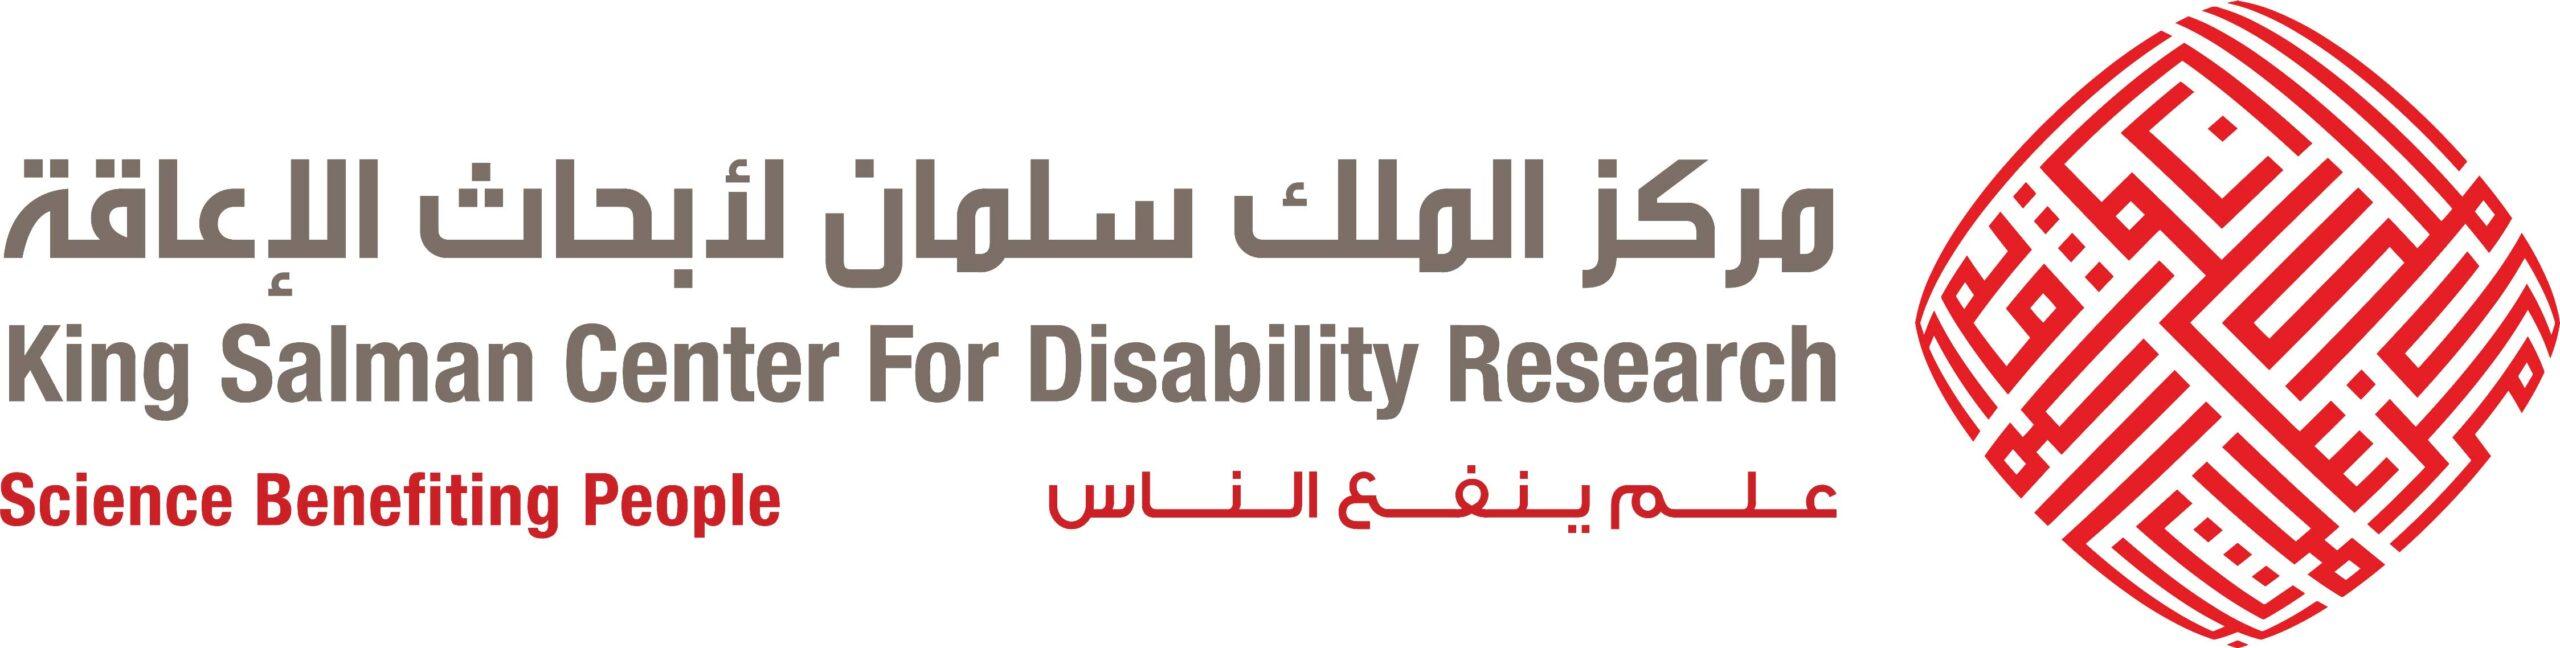 king salman center for disability research logo